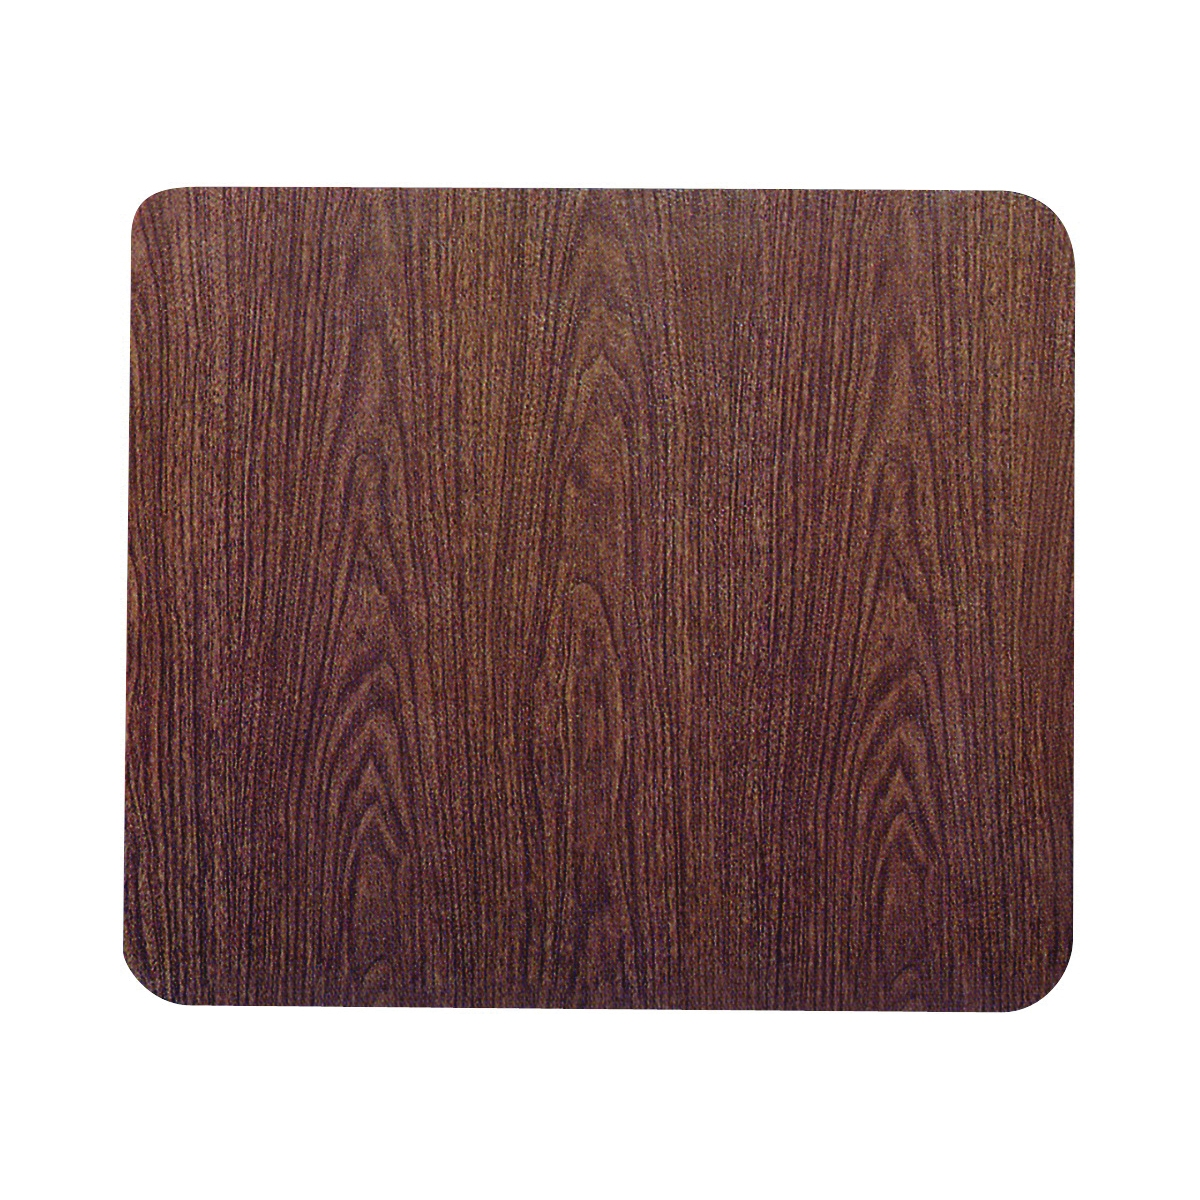 Picture of HY-C U3232WW6 Stove Board, 32 in L, 32 in W